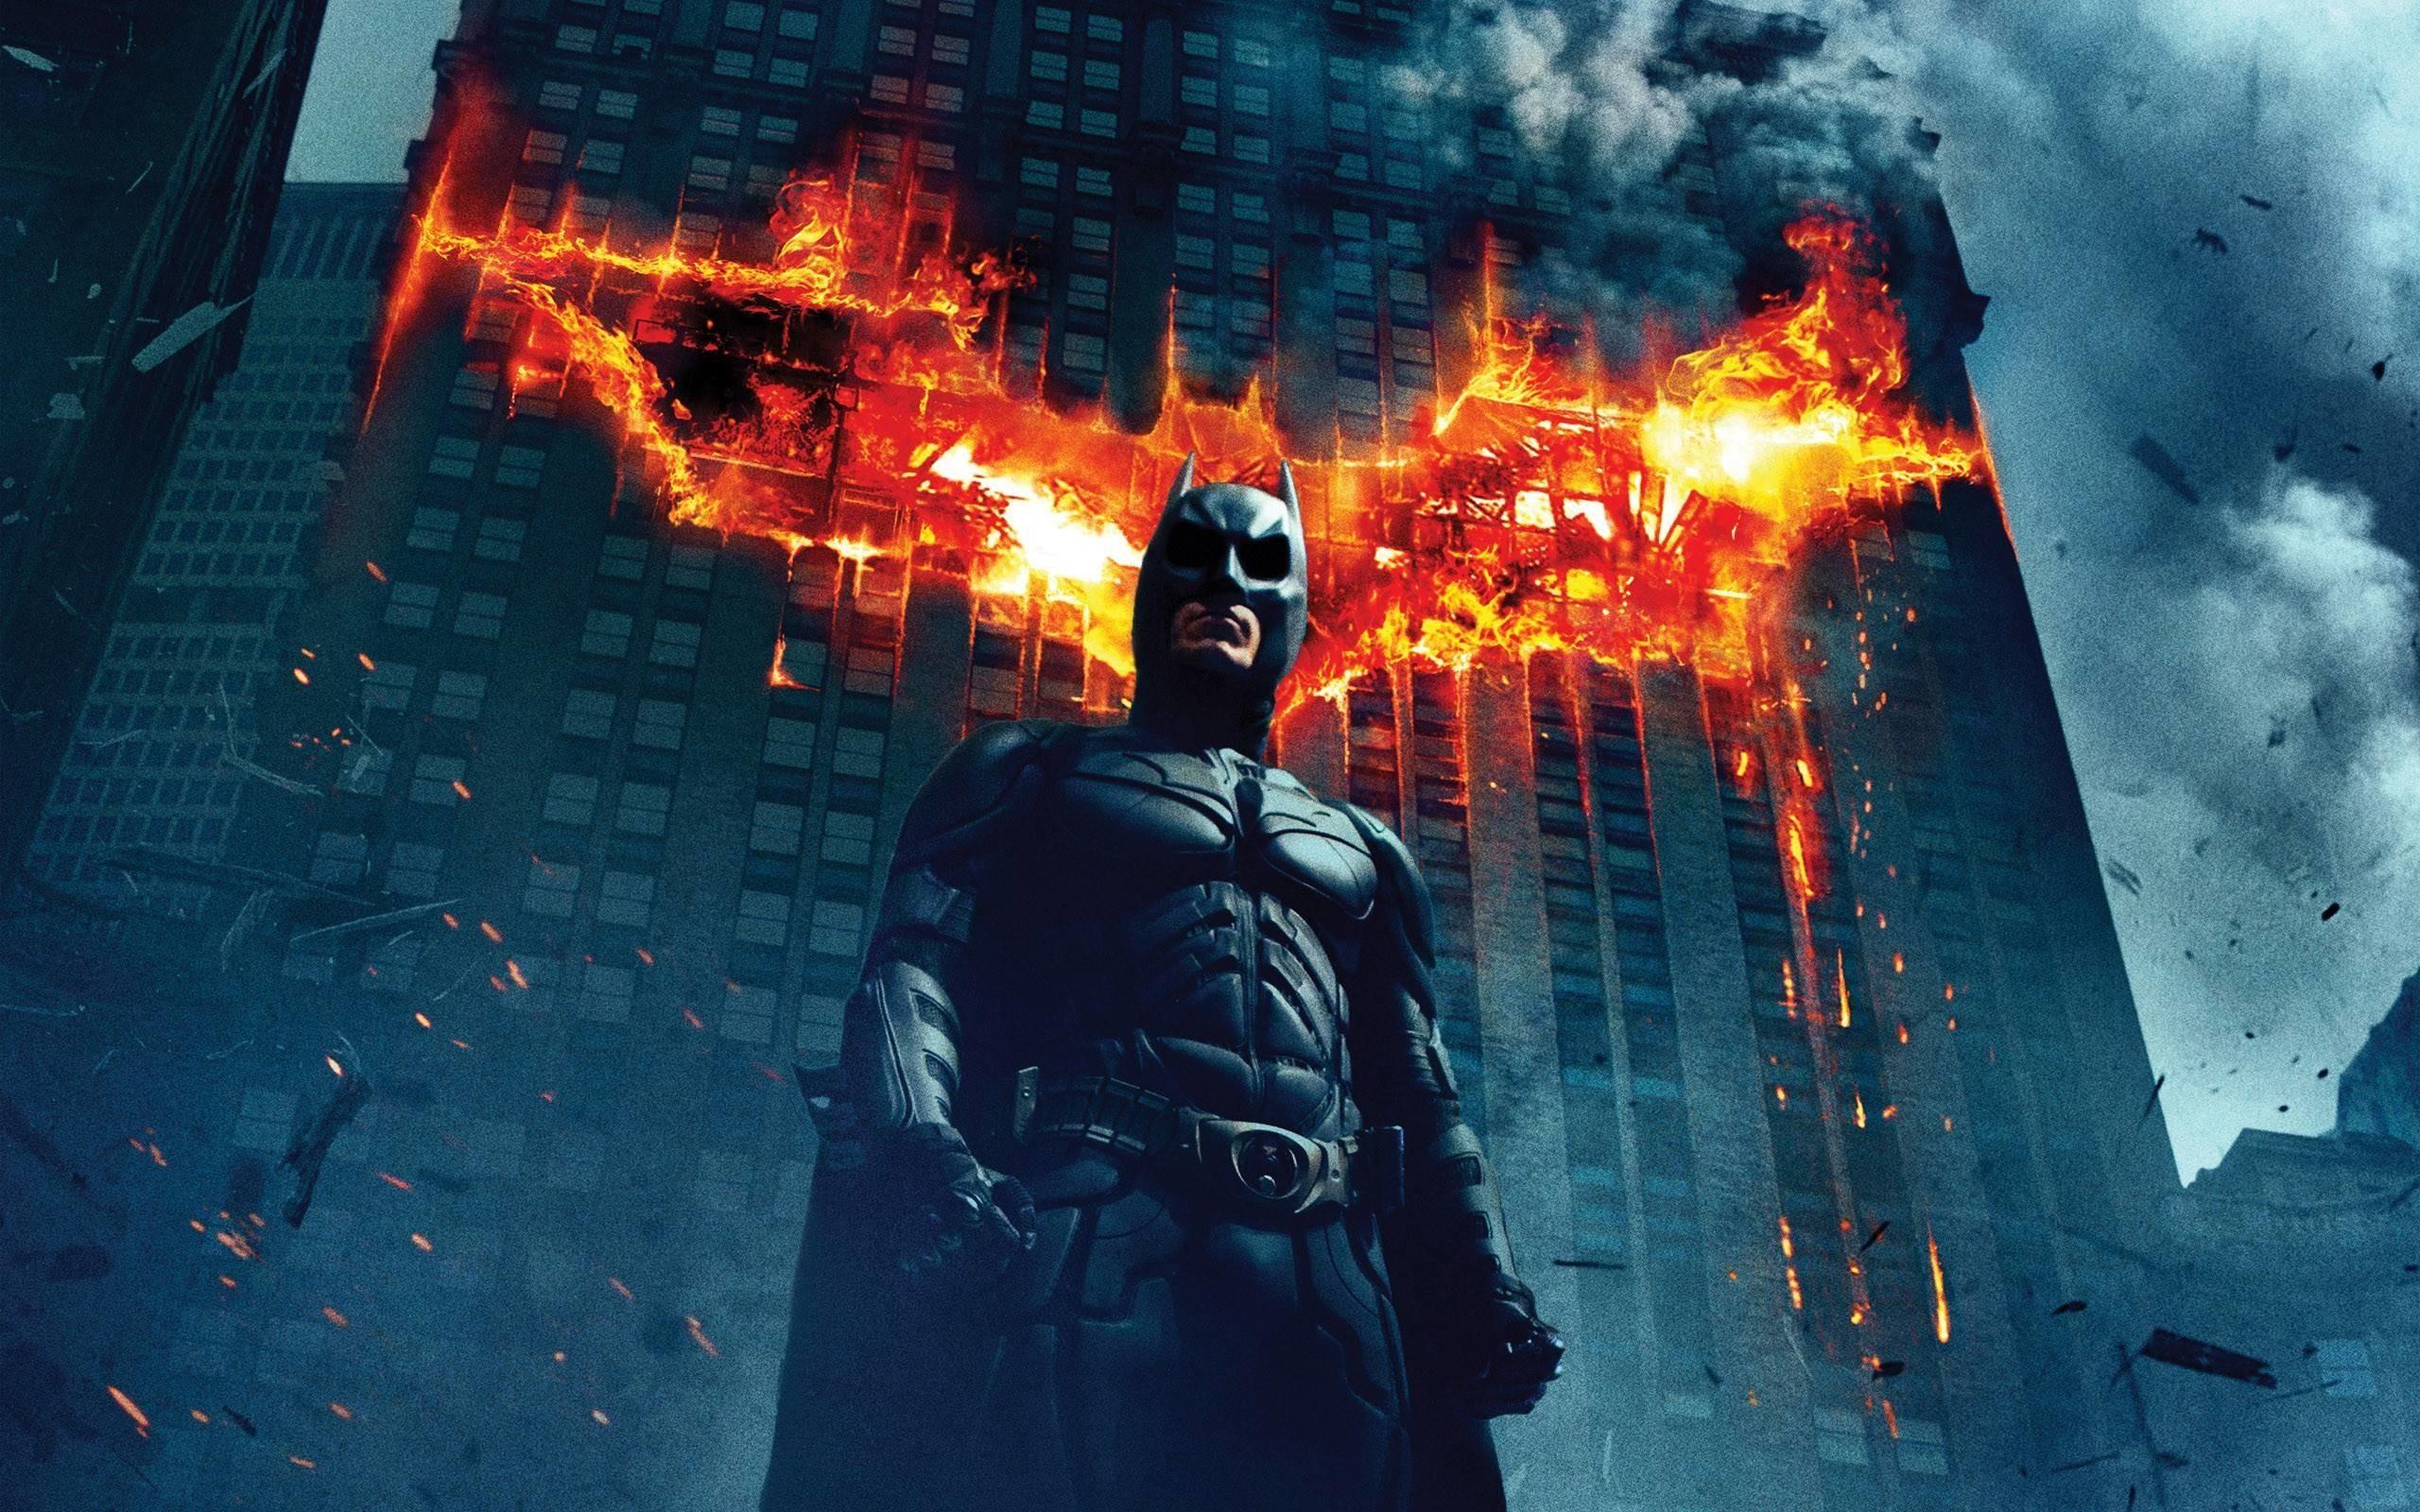 Batman The Dark Knight Online